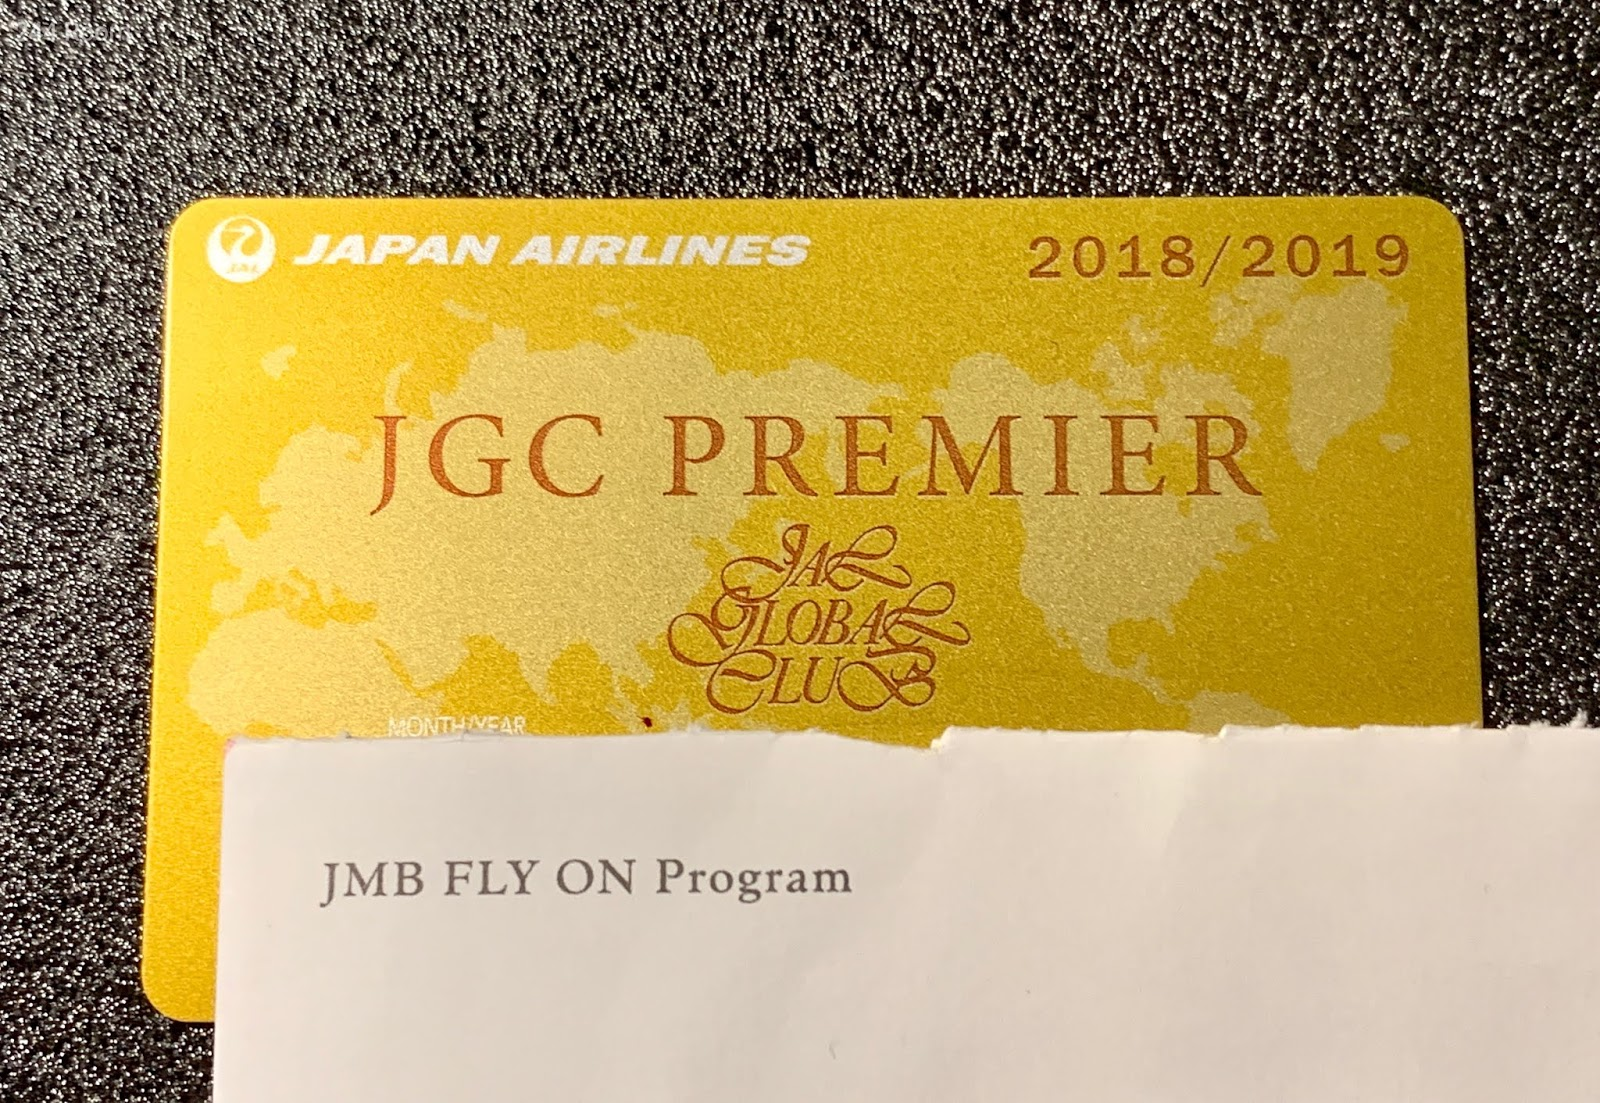 JGC PREMIER Card2